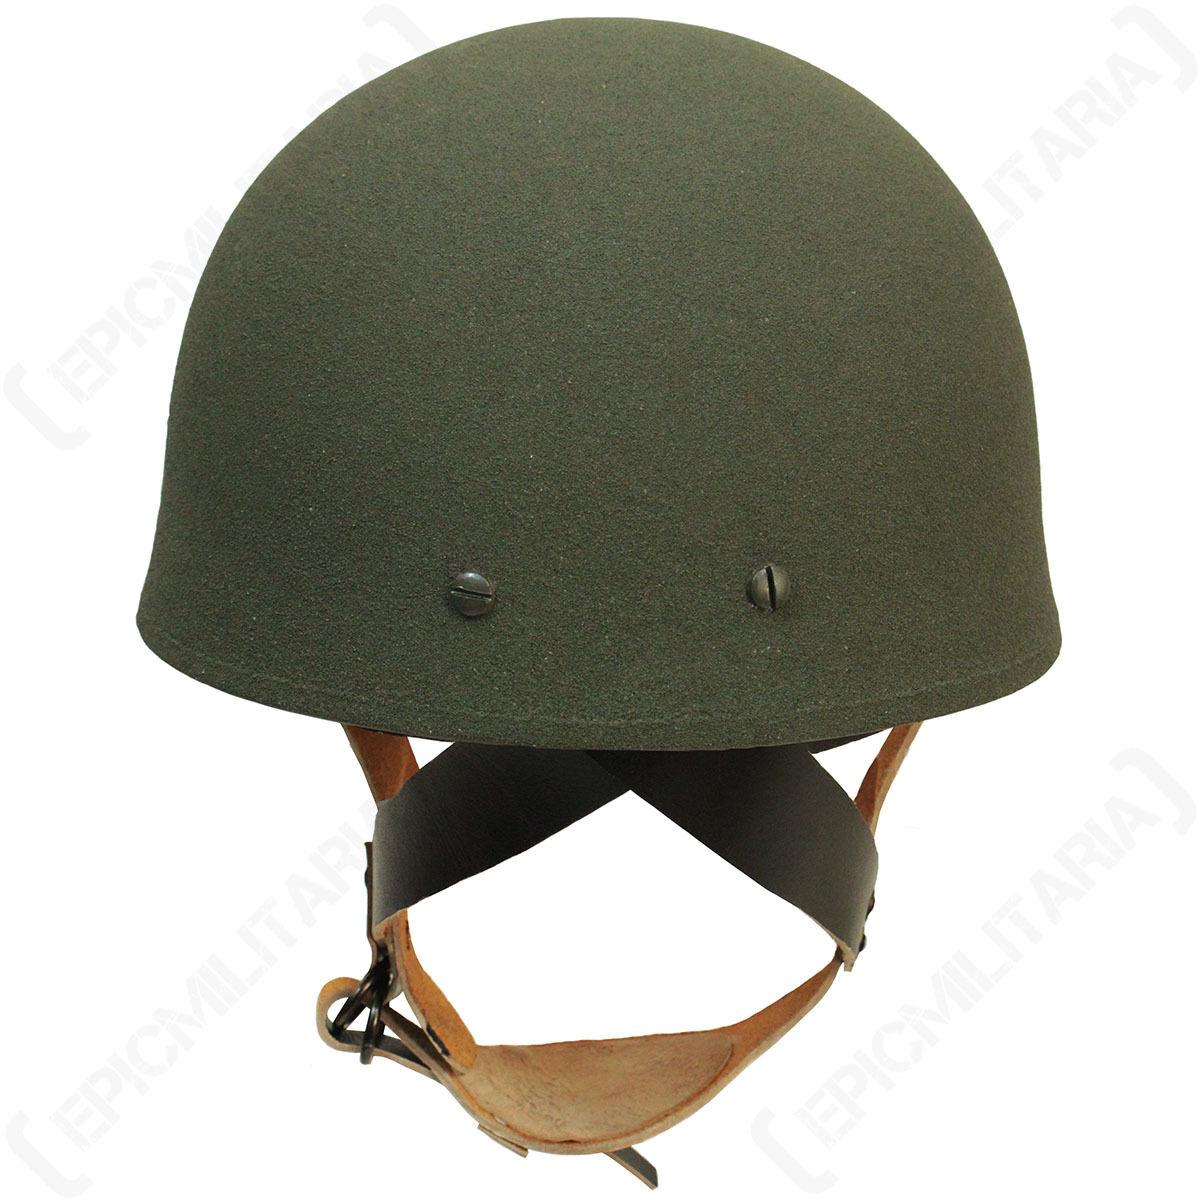 WW2 BRITISH PARATROOPER Helmet - Repro Army Para Soldier ...